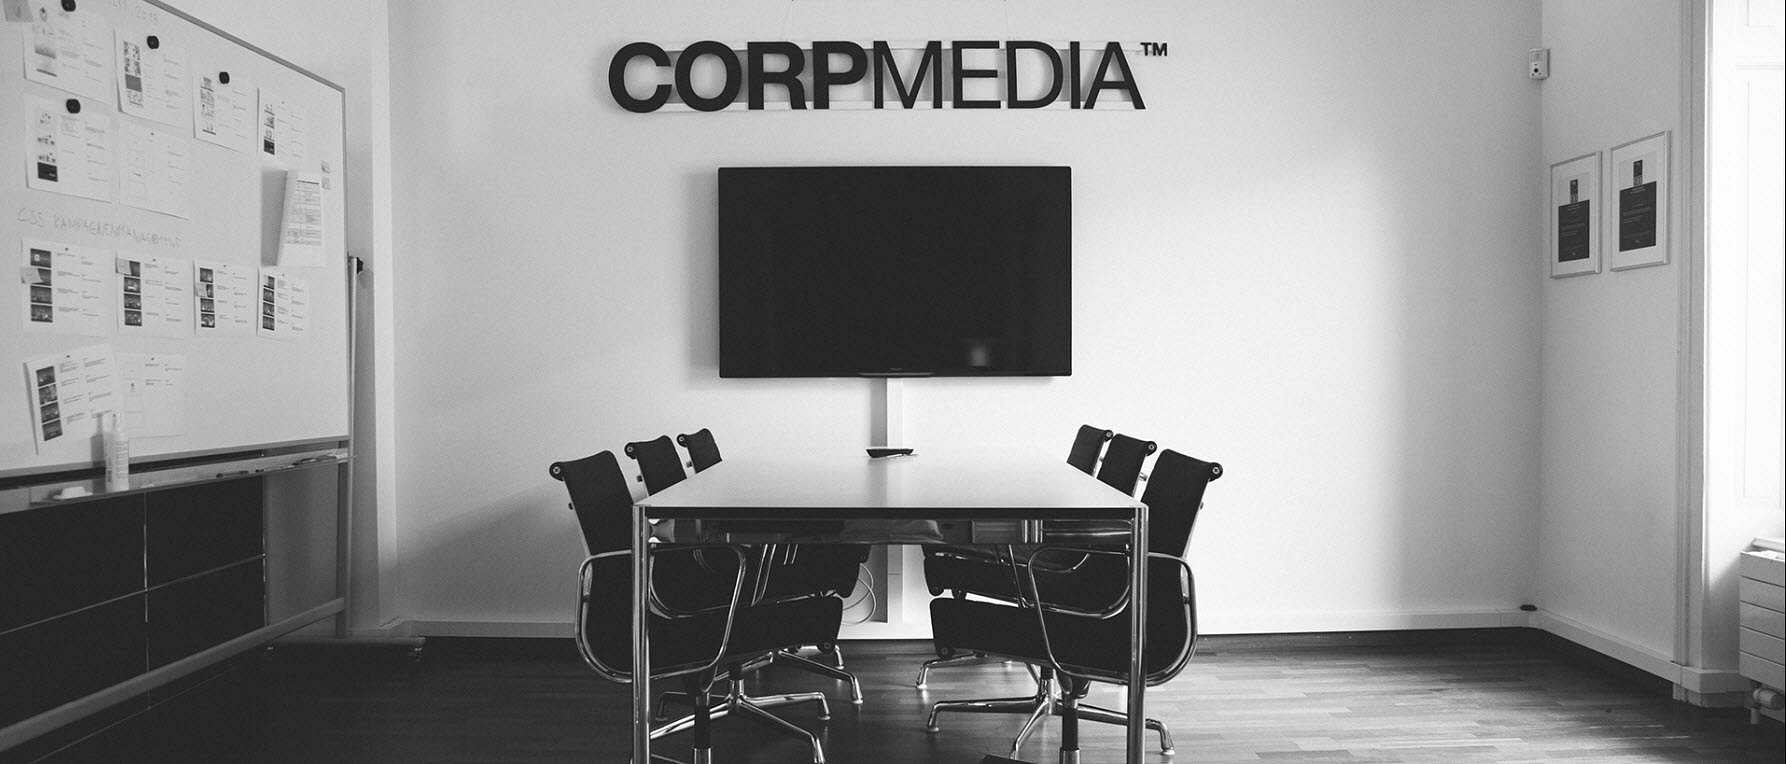 CORPMEDIA AG